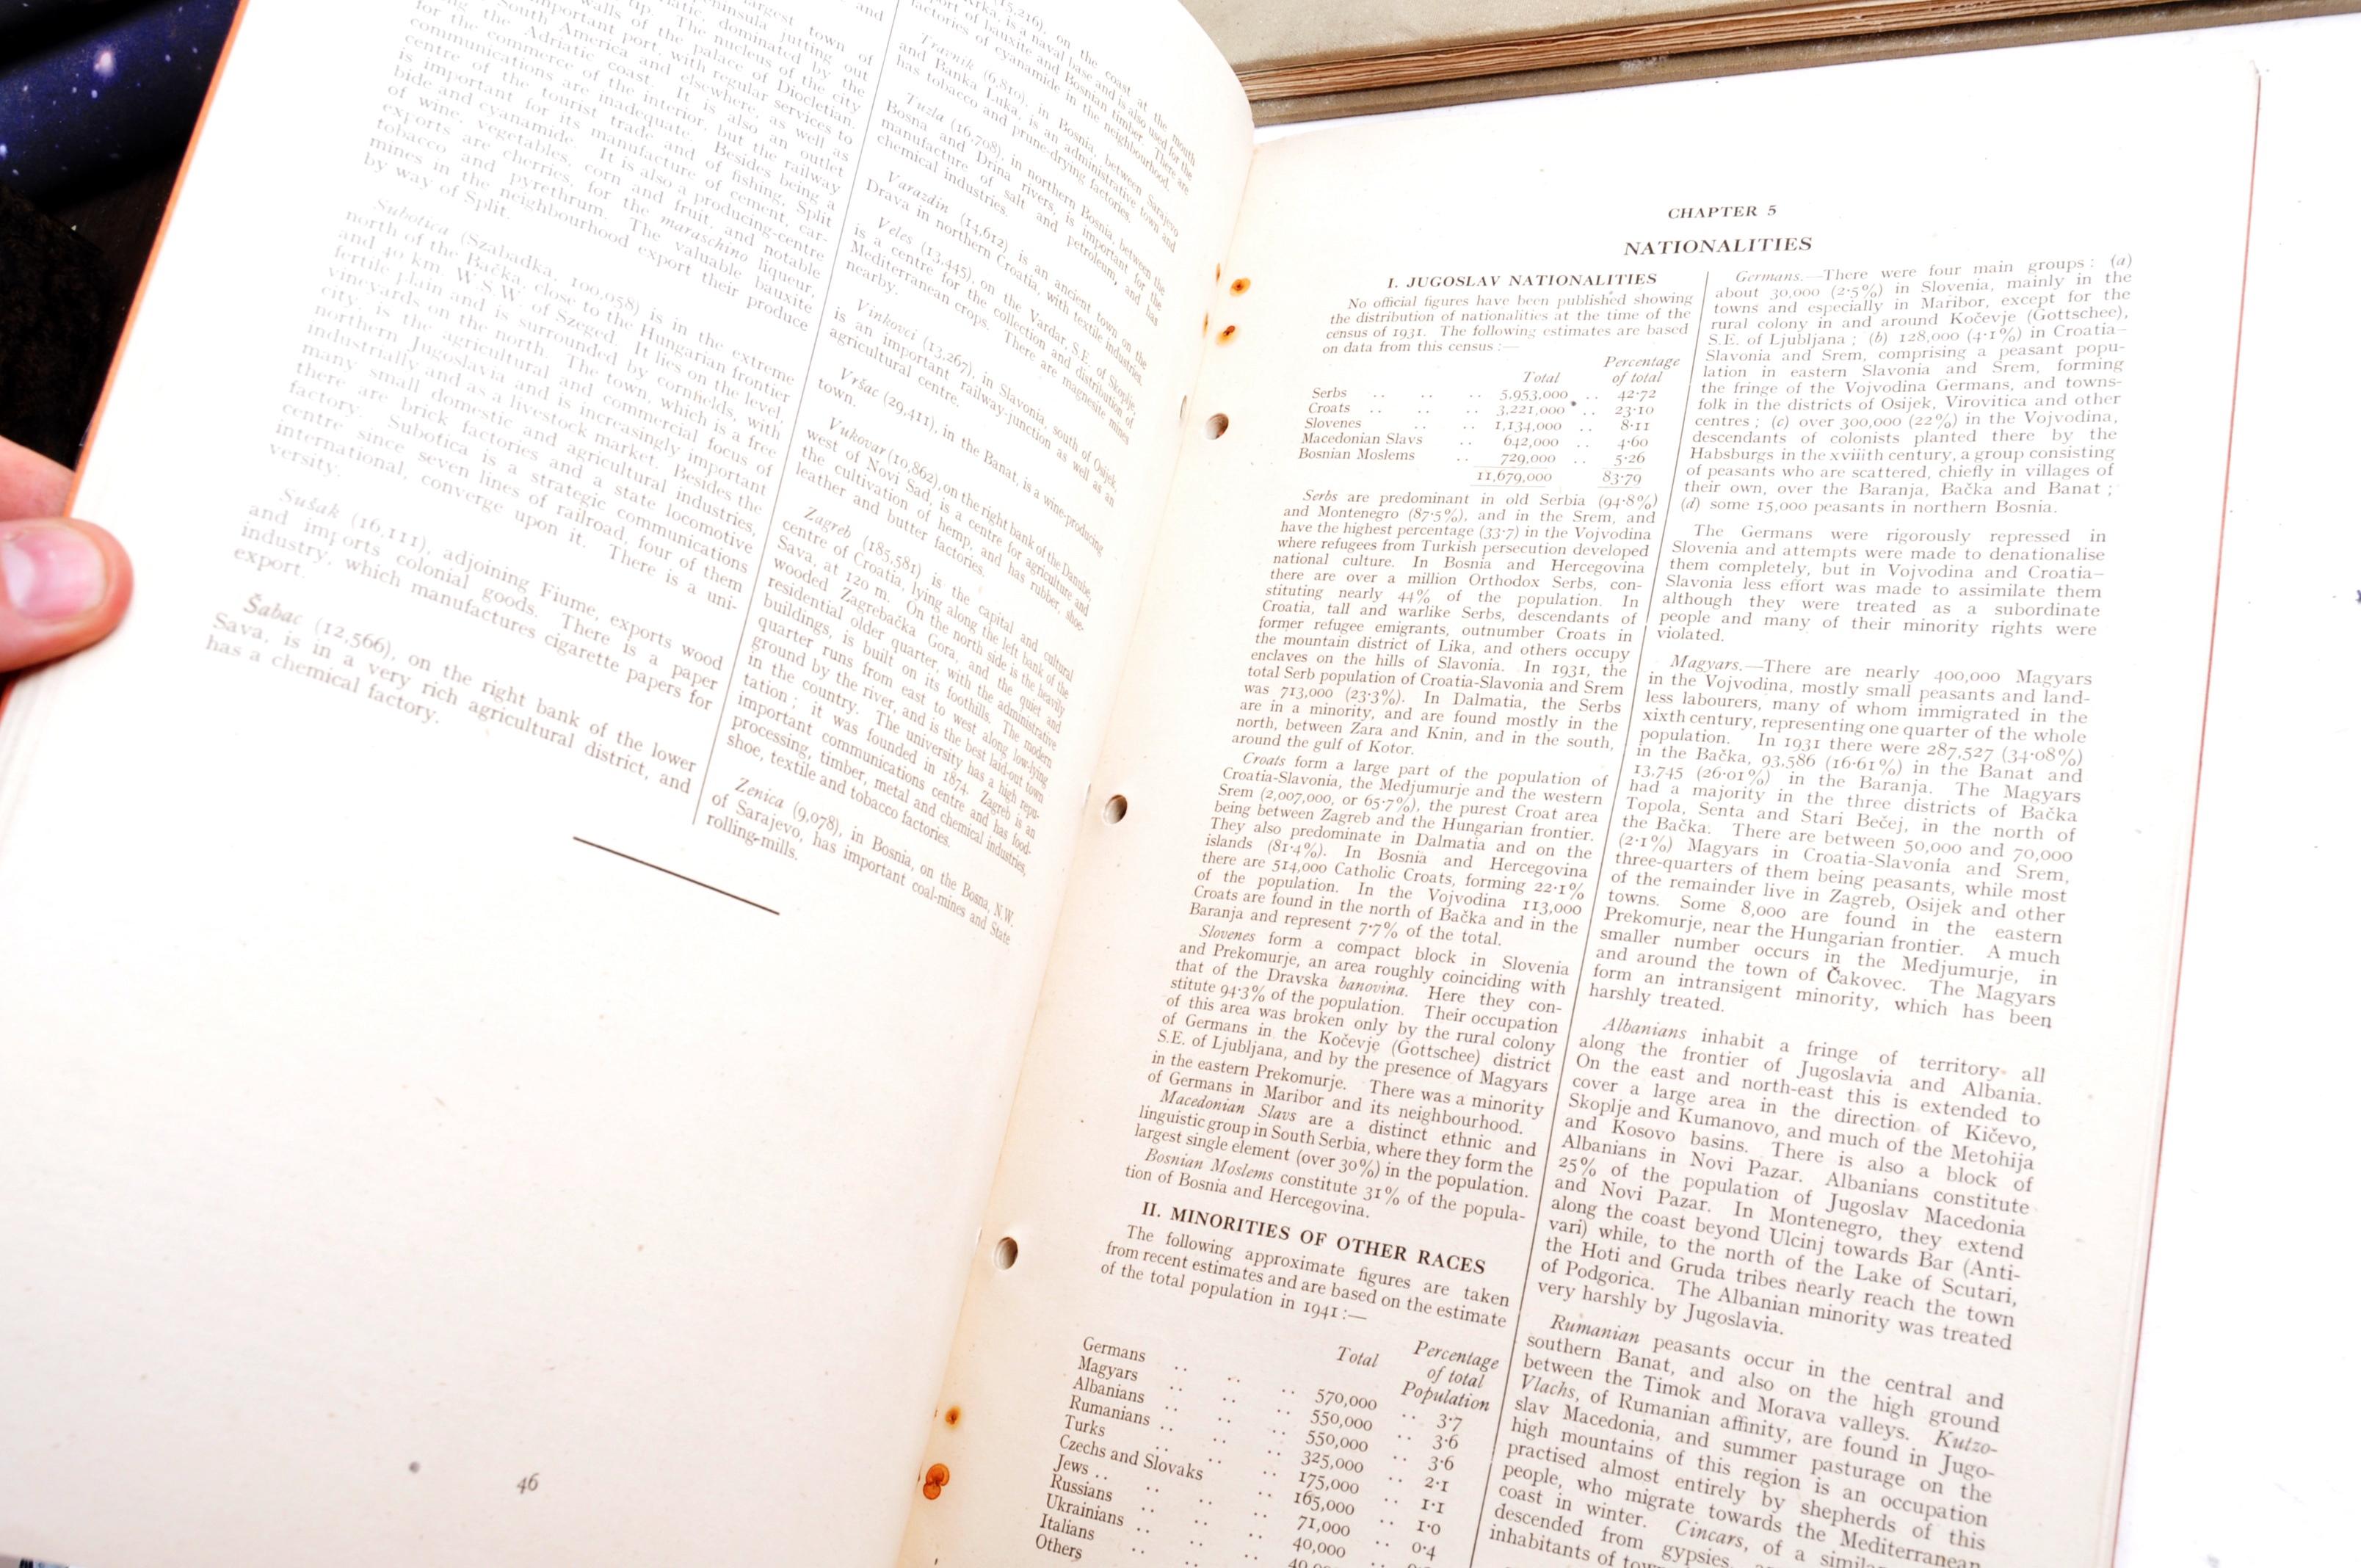 RARE ORIGINAL WWII 'SECRET' JUGOSLAVIA BRITISH HANDBOOKS - Image 3 of 9